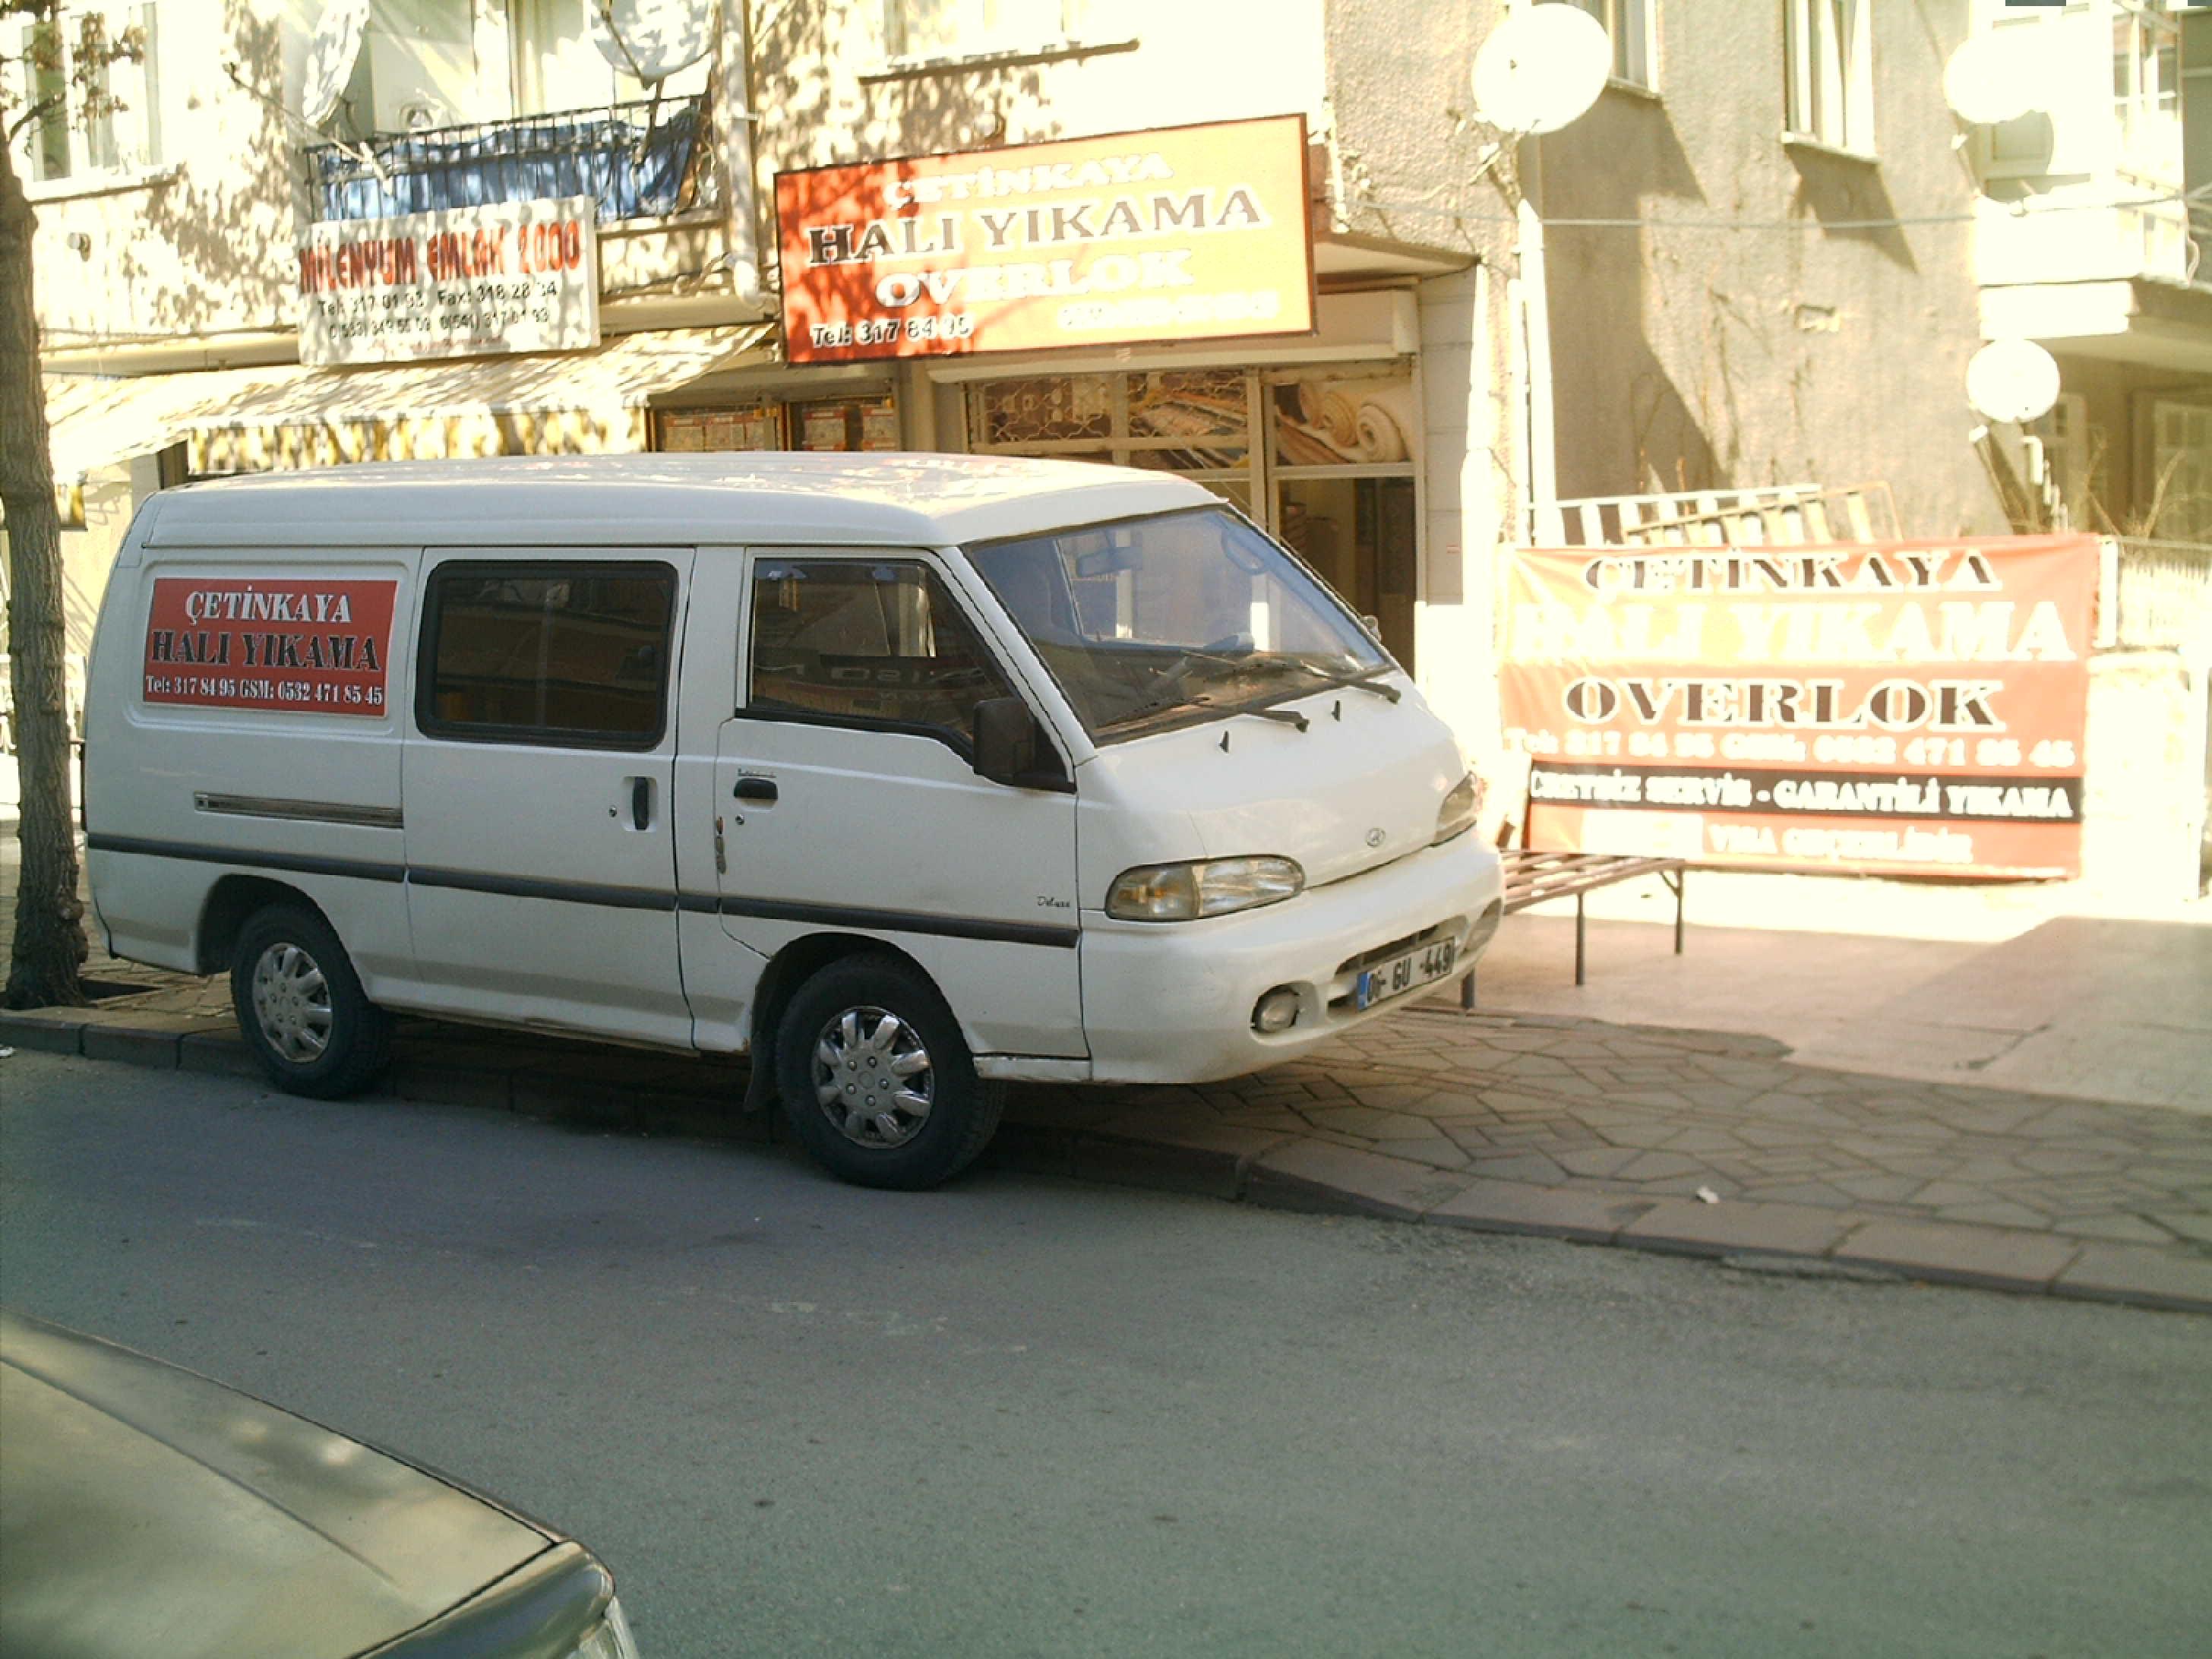 etlik_hali_yikama_servis-1-1